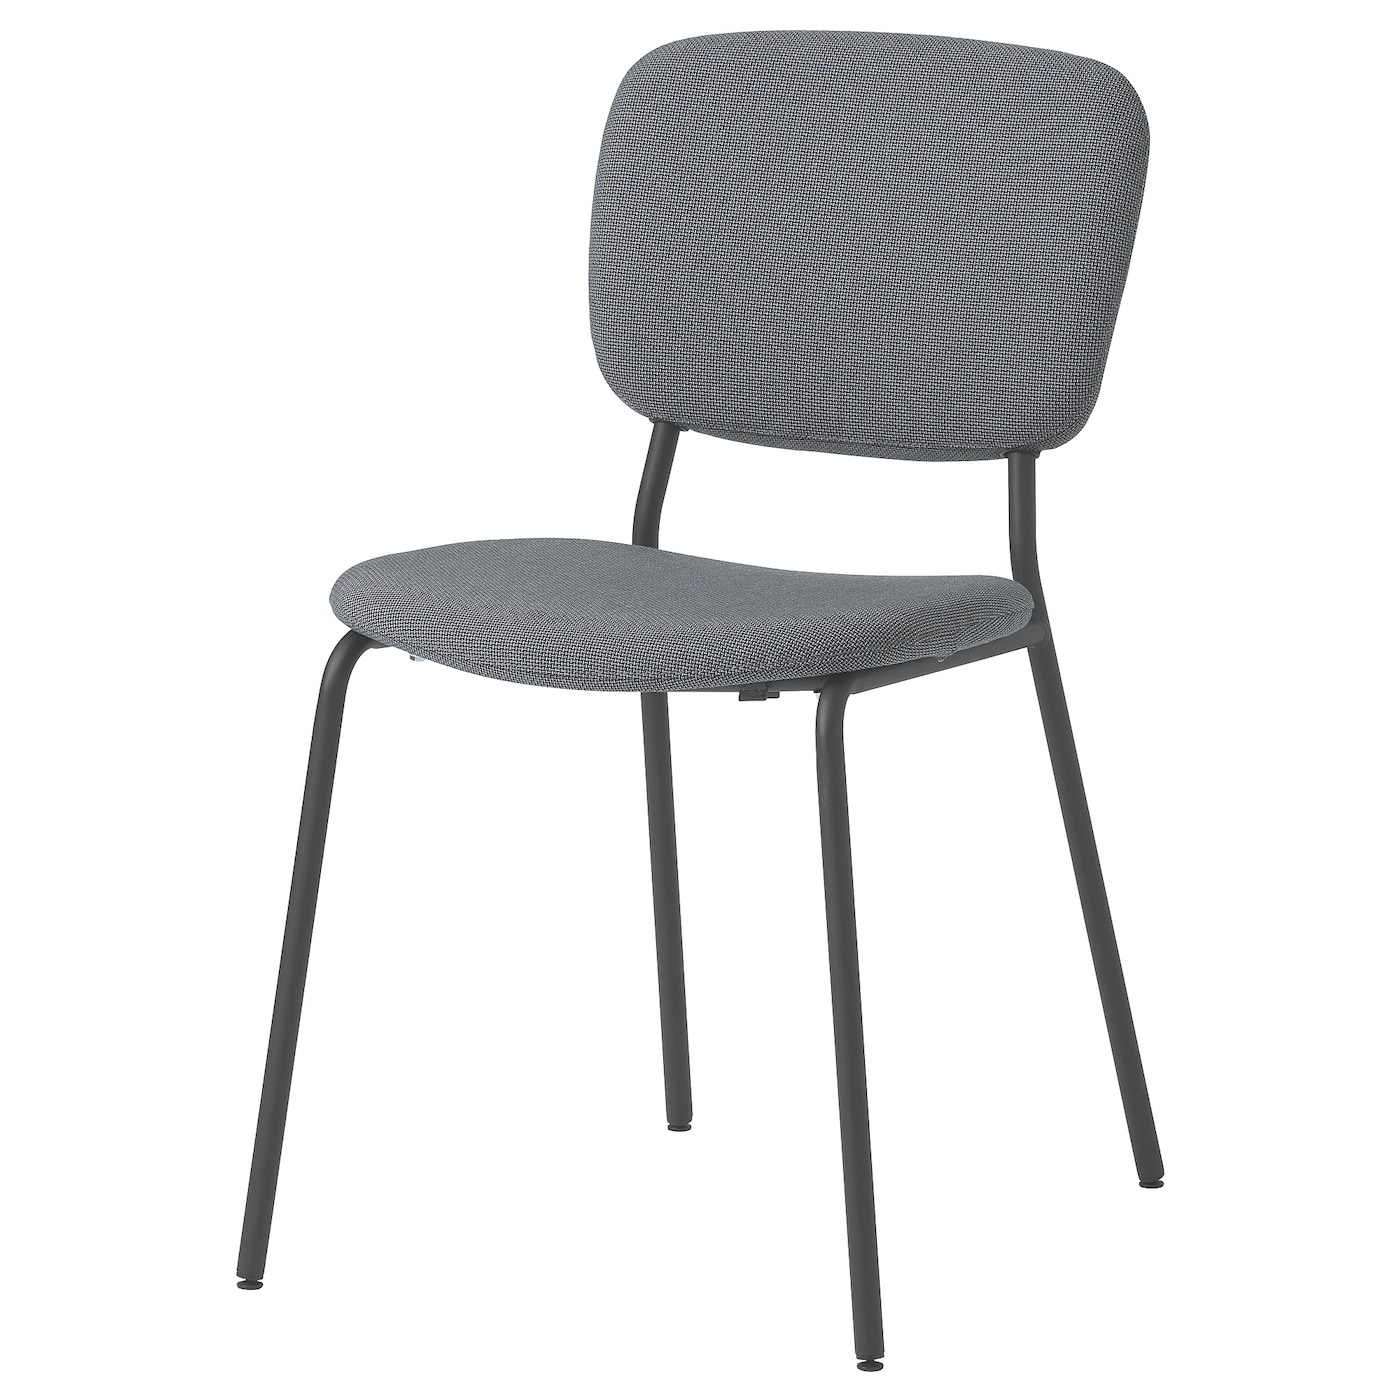 KARLJAN Chair   dark gray/Kabusa dark gray